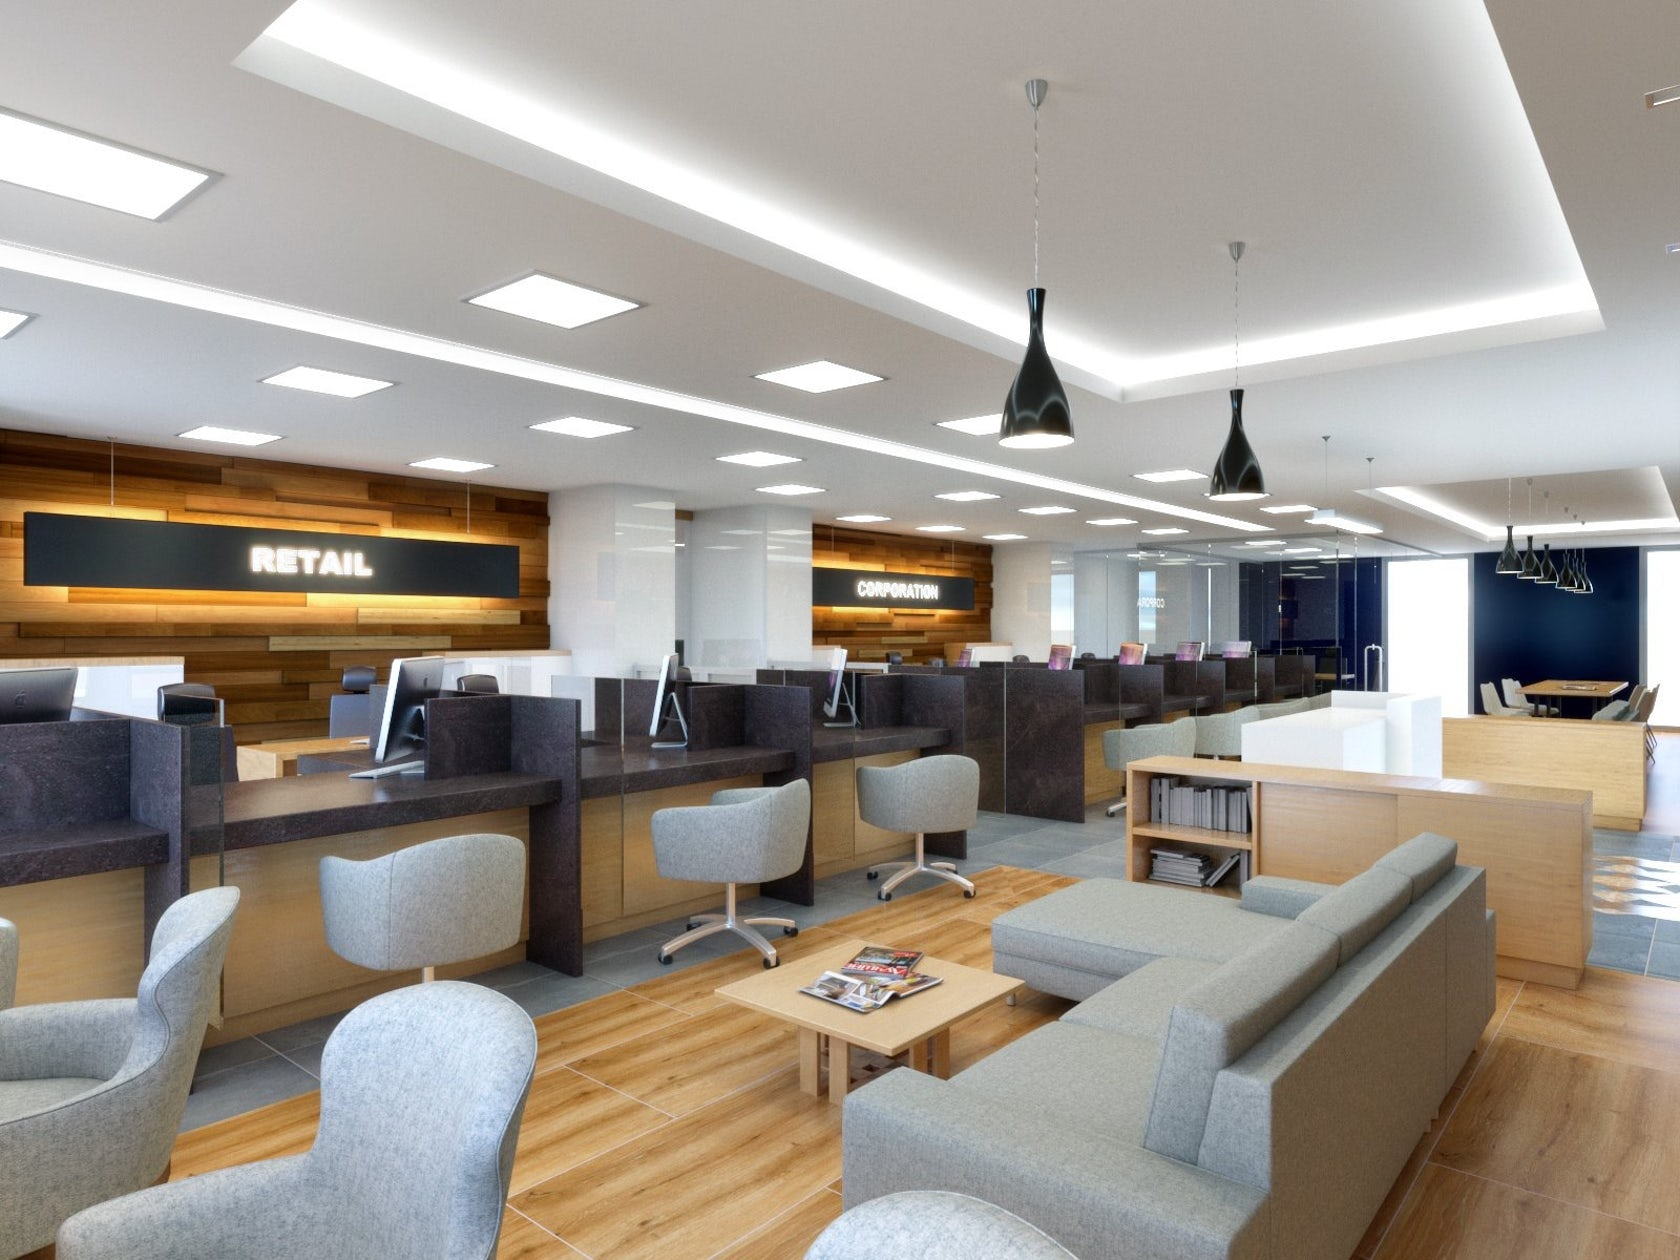 Renders 3d For Master Bedroom Project: Bank Customer Lounge Interior Renders